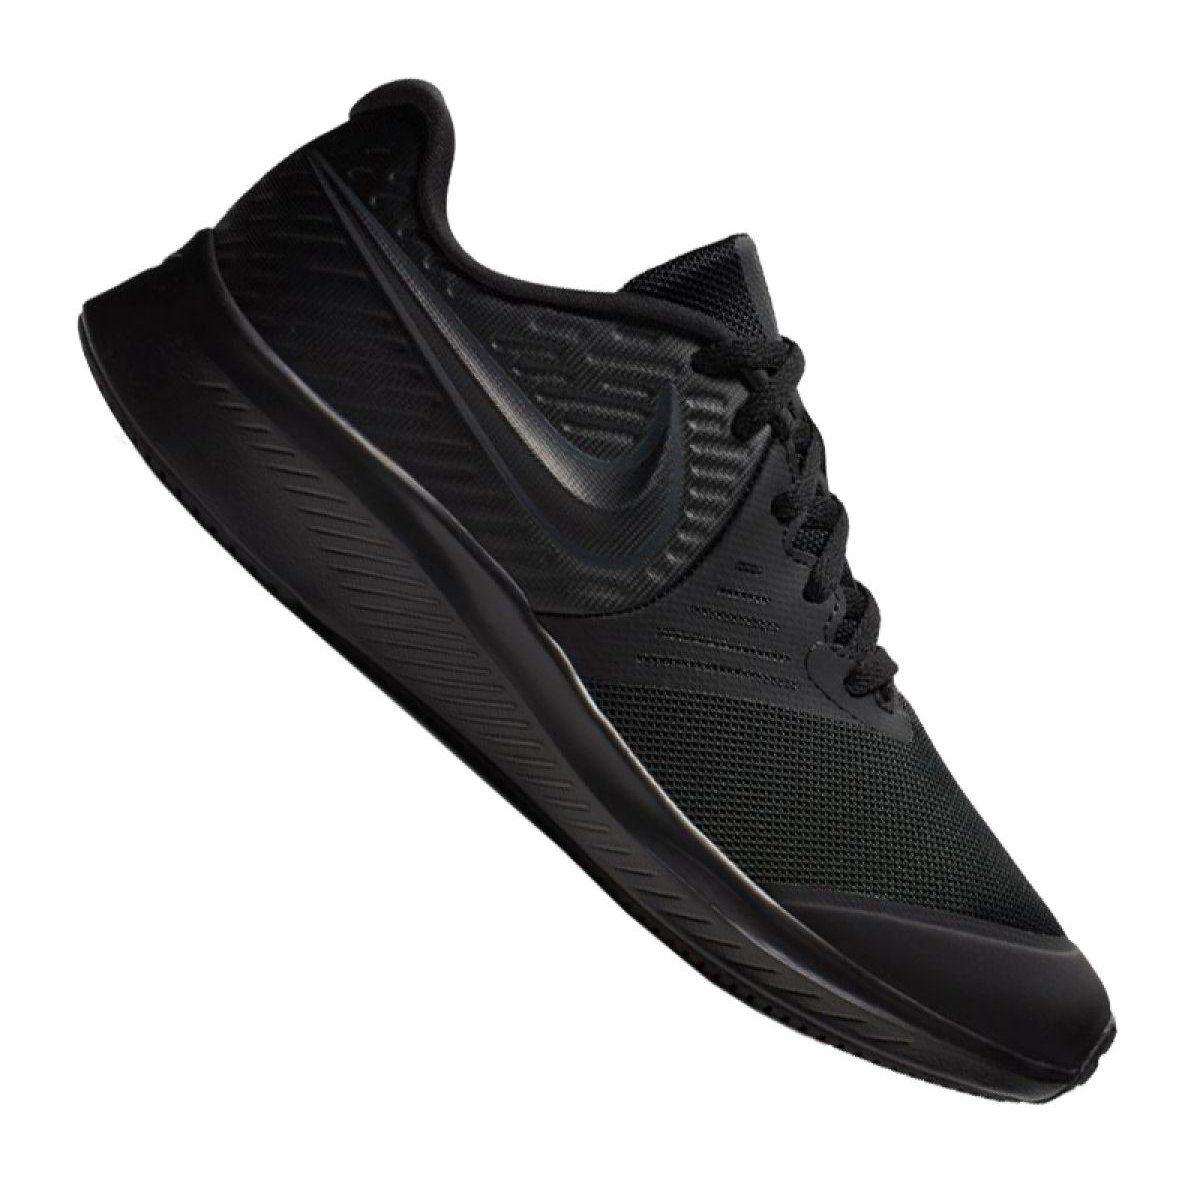 NEW Boys Kids Youth NIKE SB Mogan Mid 2 Jr 645025 002 Black Red Sneakers Shoes